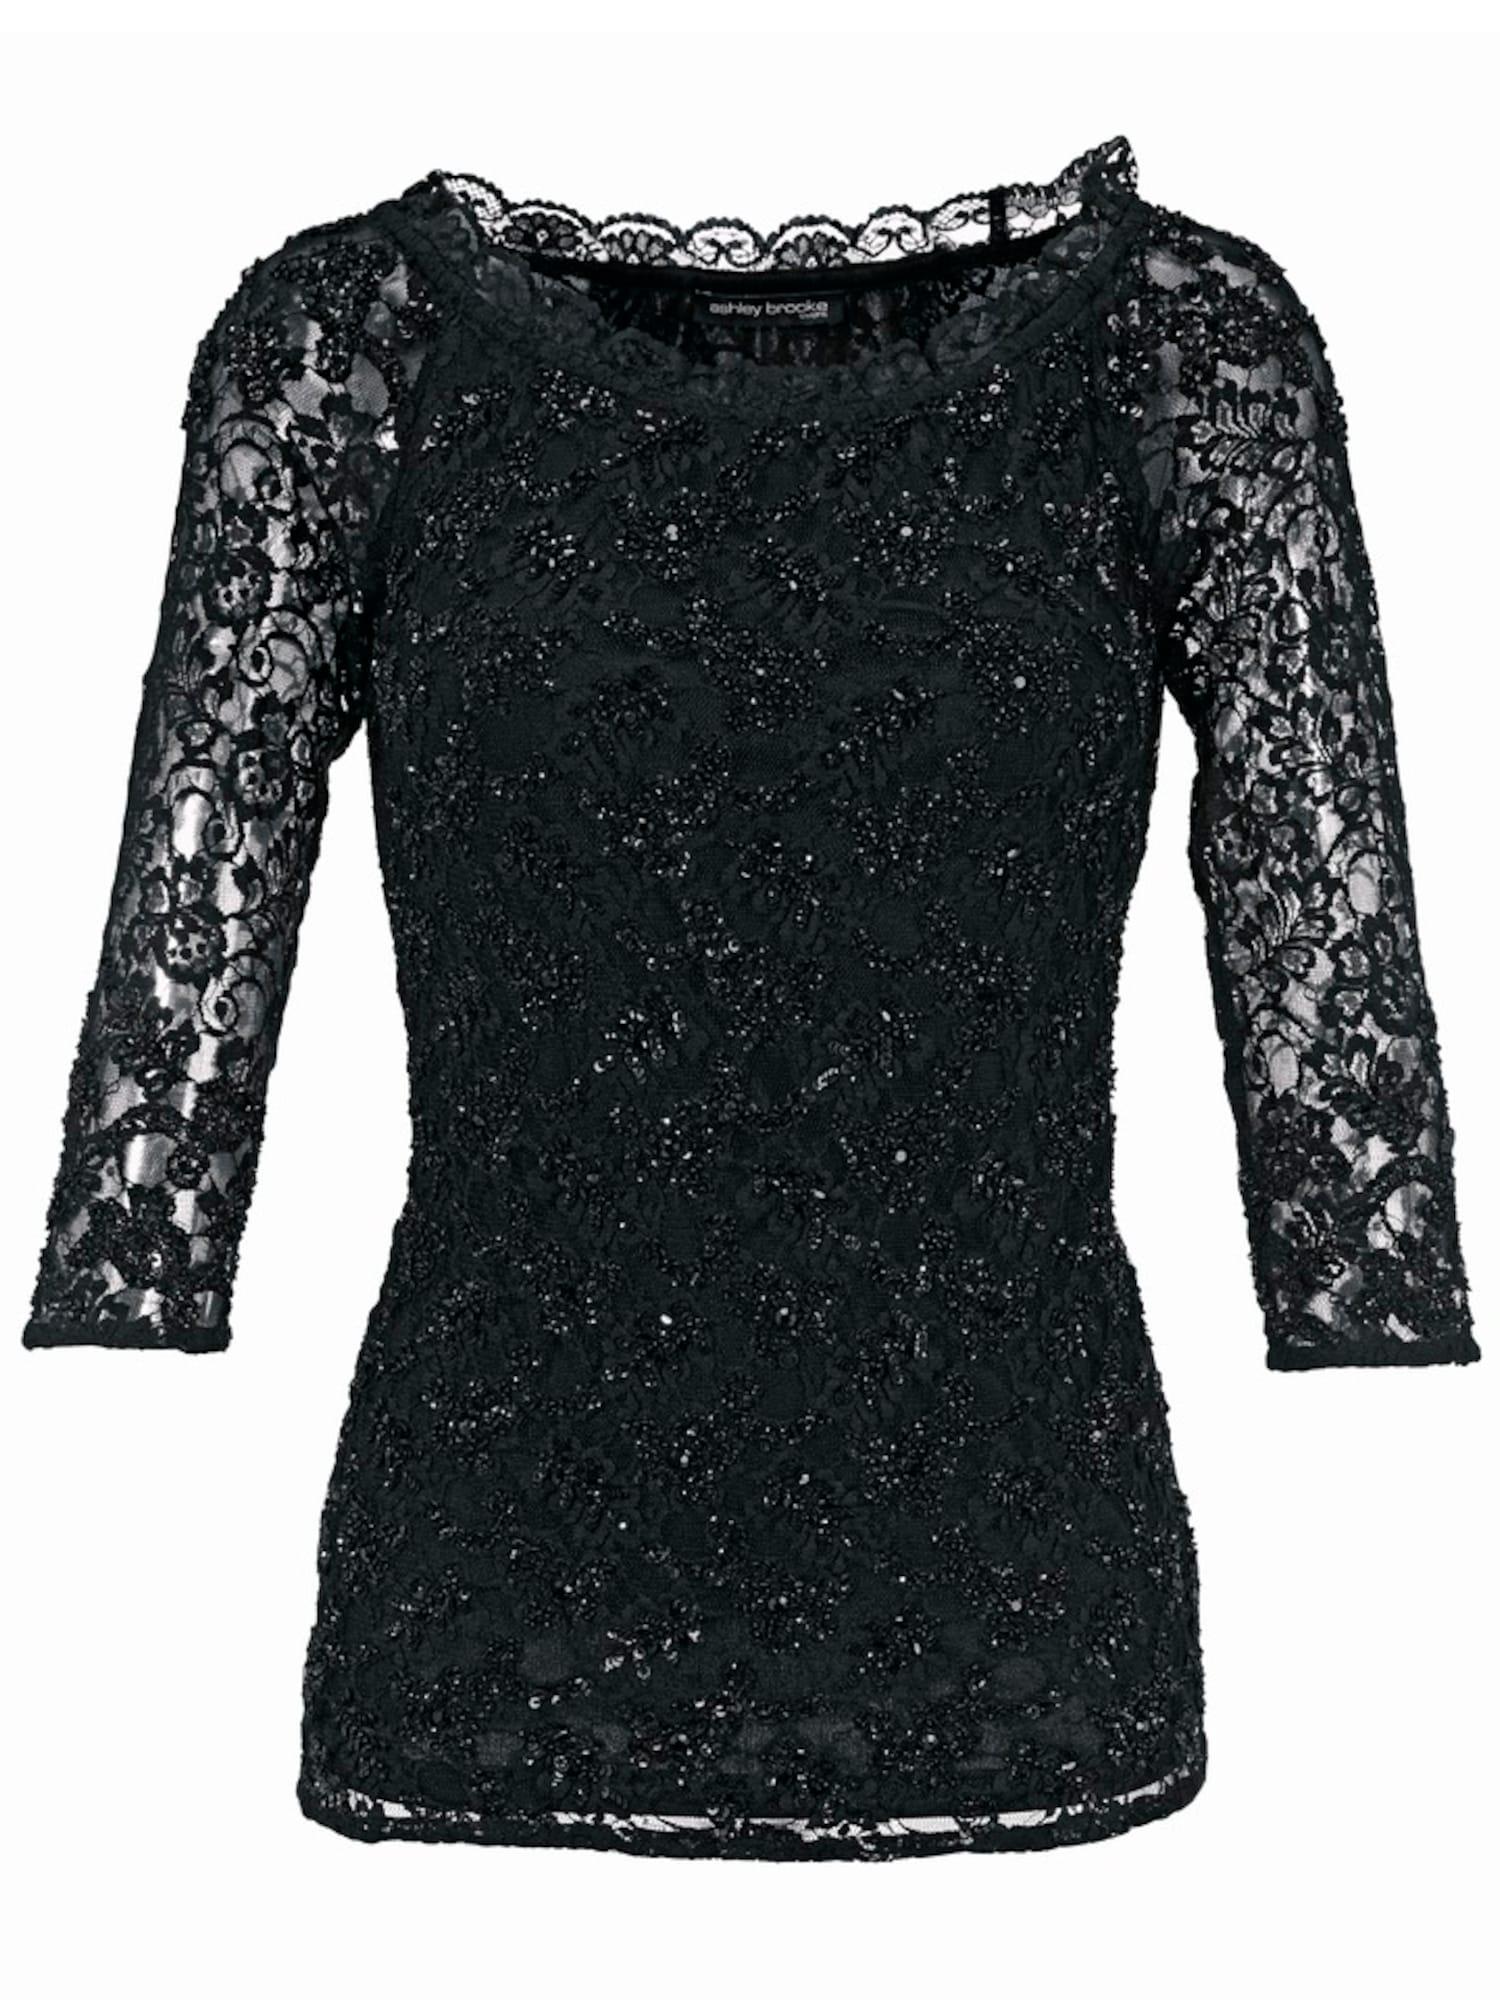 Carmenshirt | Bekleidung > Shirts > Carmenshirts & Wasserfallshirts | Schwarz - Silber | heine